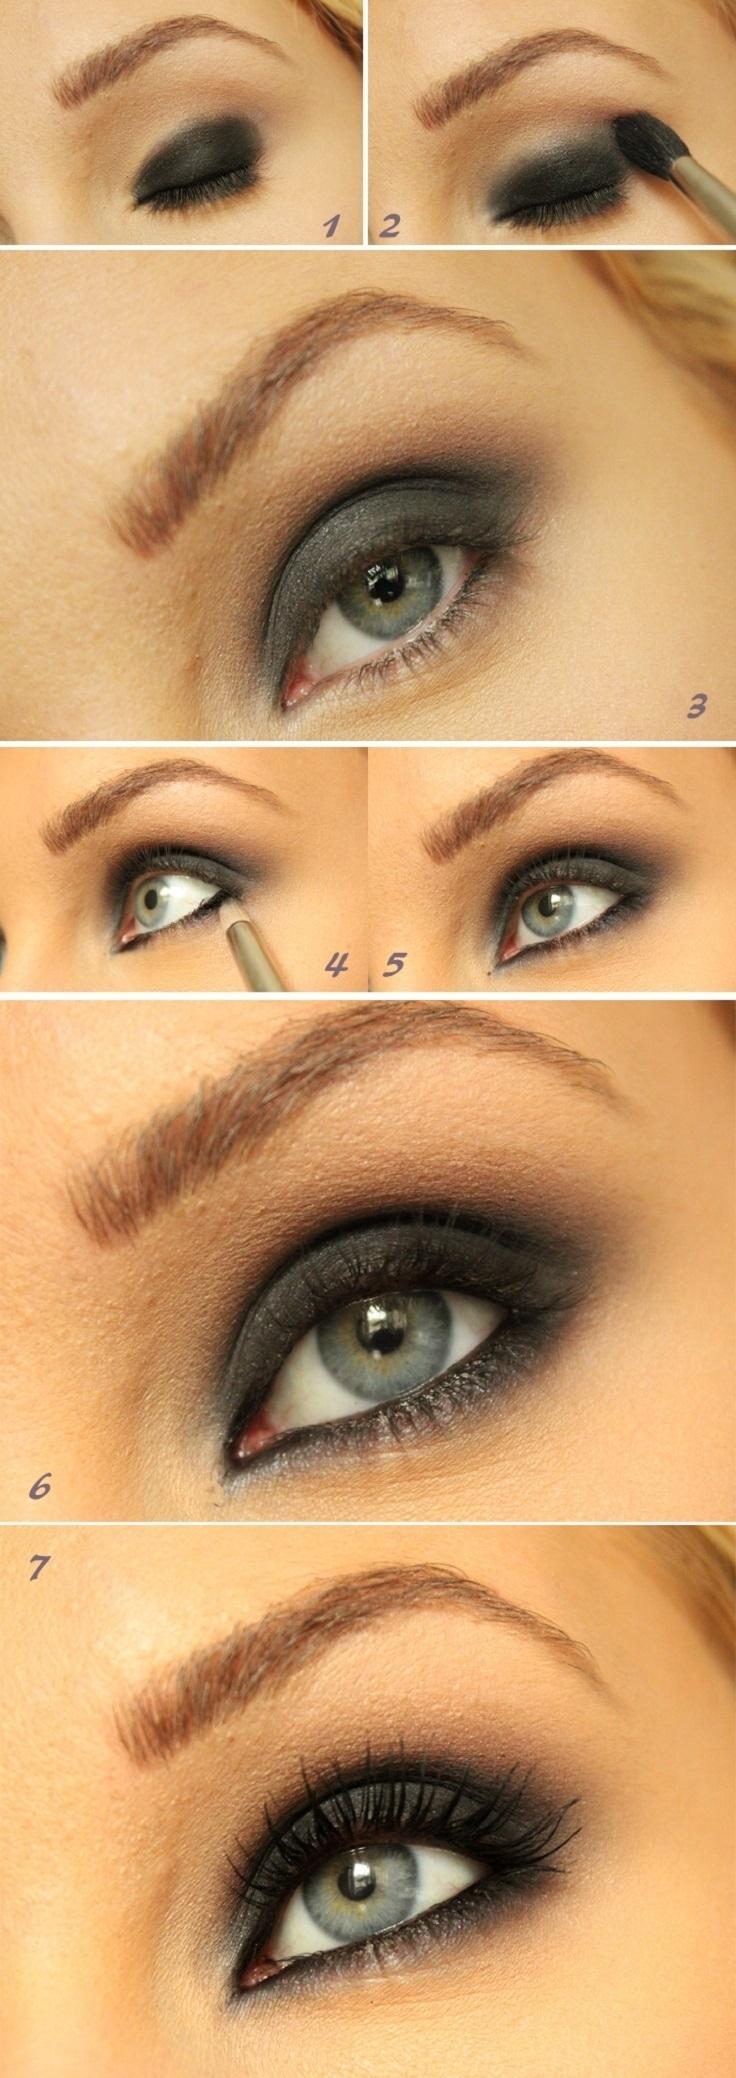 Makeup Tutorial For Big Green Eyes | Saubhaya Makeup inside How To Do Makeup For Big Green Eyes